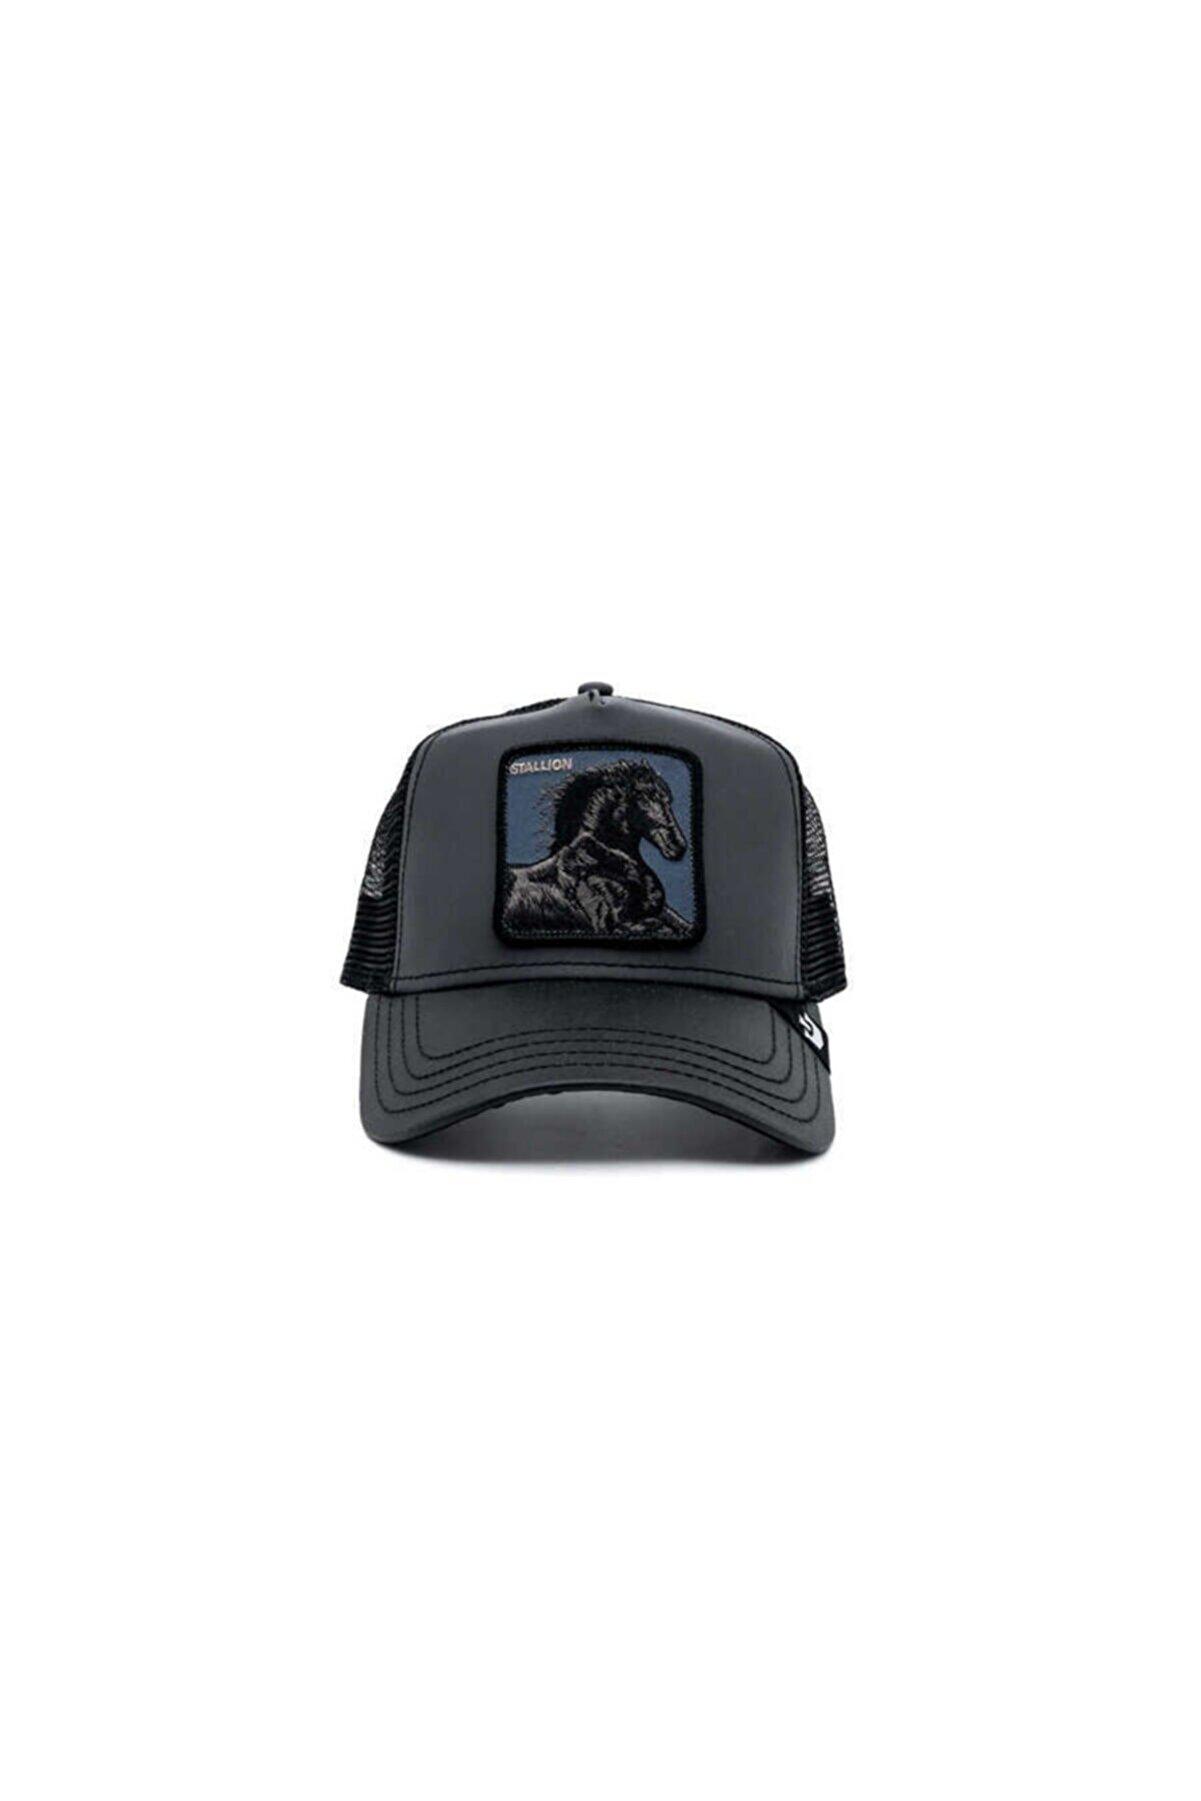 Goorin Bros Unisex Siyah Ride That Stallion  Şapka 101-2679 Standart